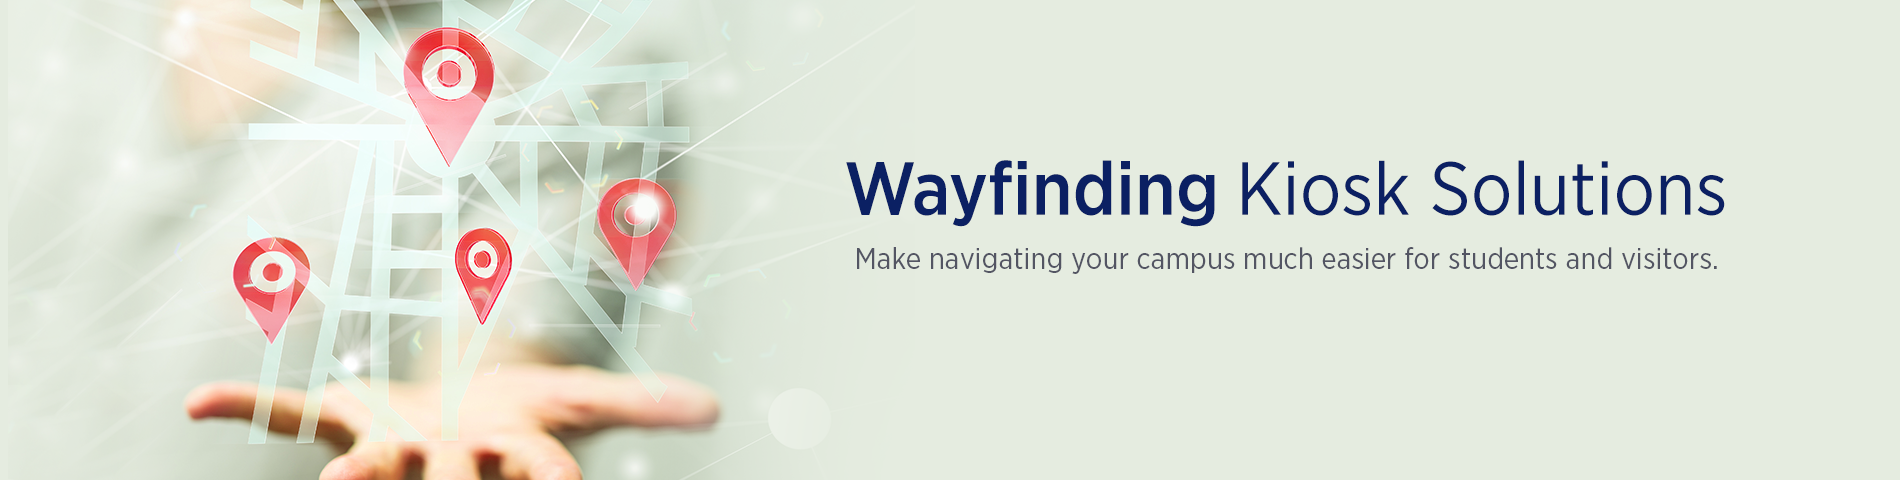 Wayfinding Solutions